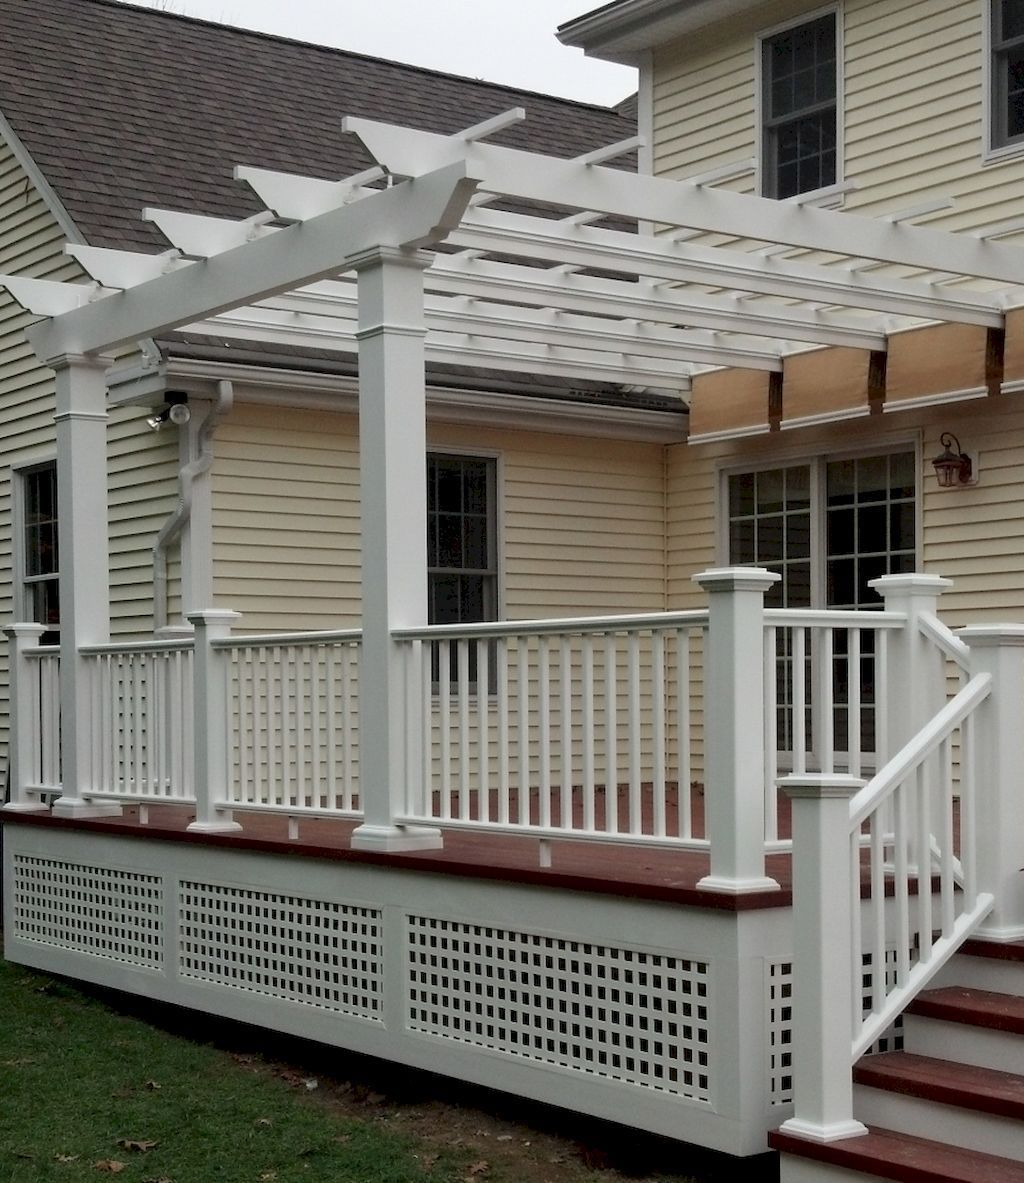 50 deck railing ideas for your home (23 | Railing ideas, Deck ...